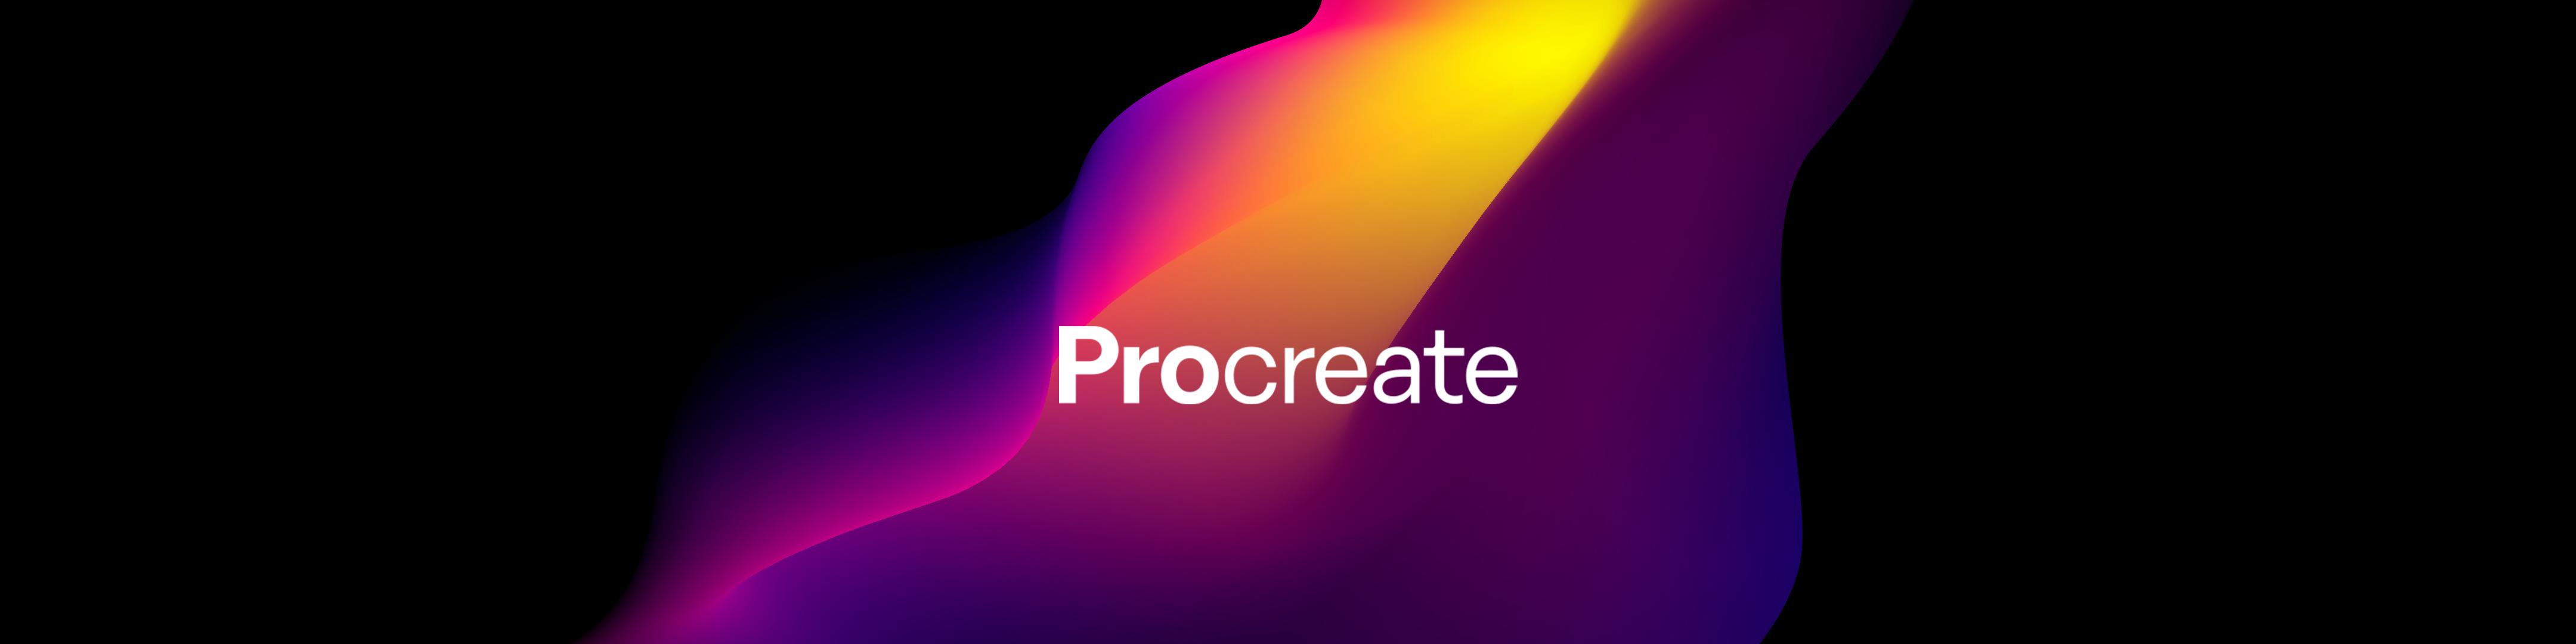 Procreate - Revenue & Download estimates - Apple App Store - US